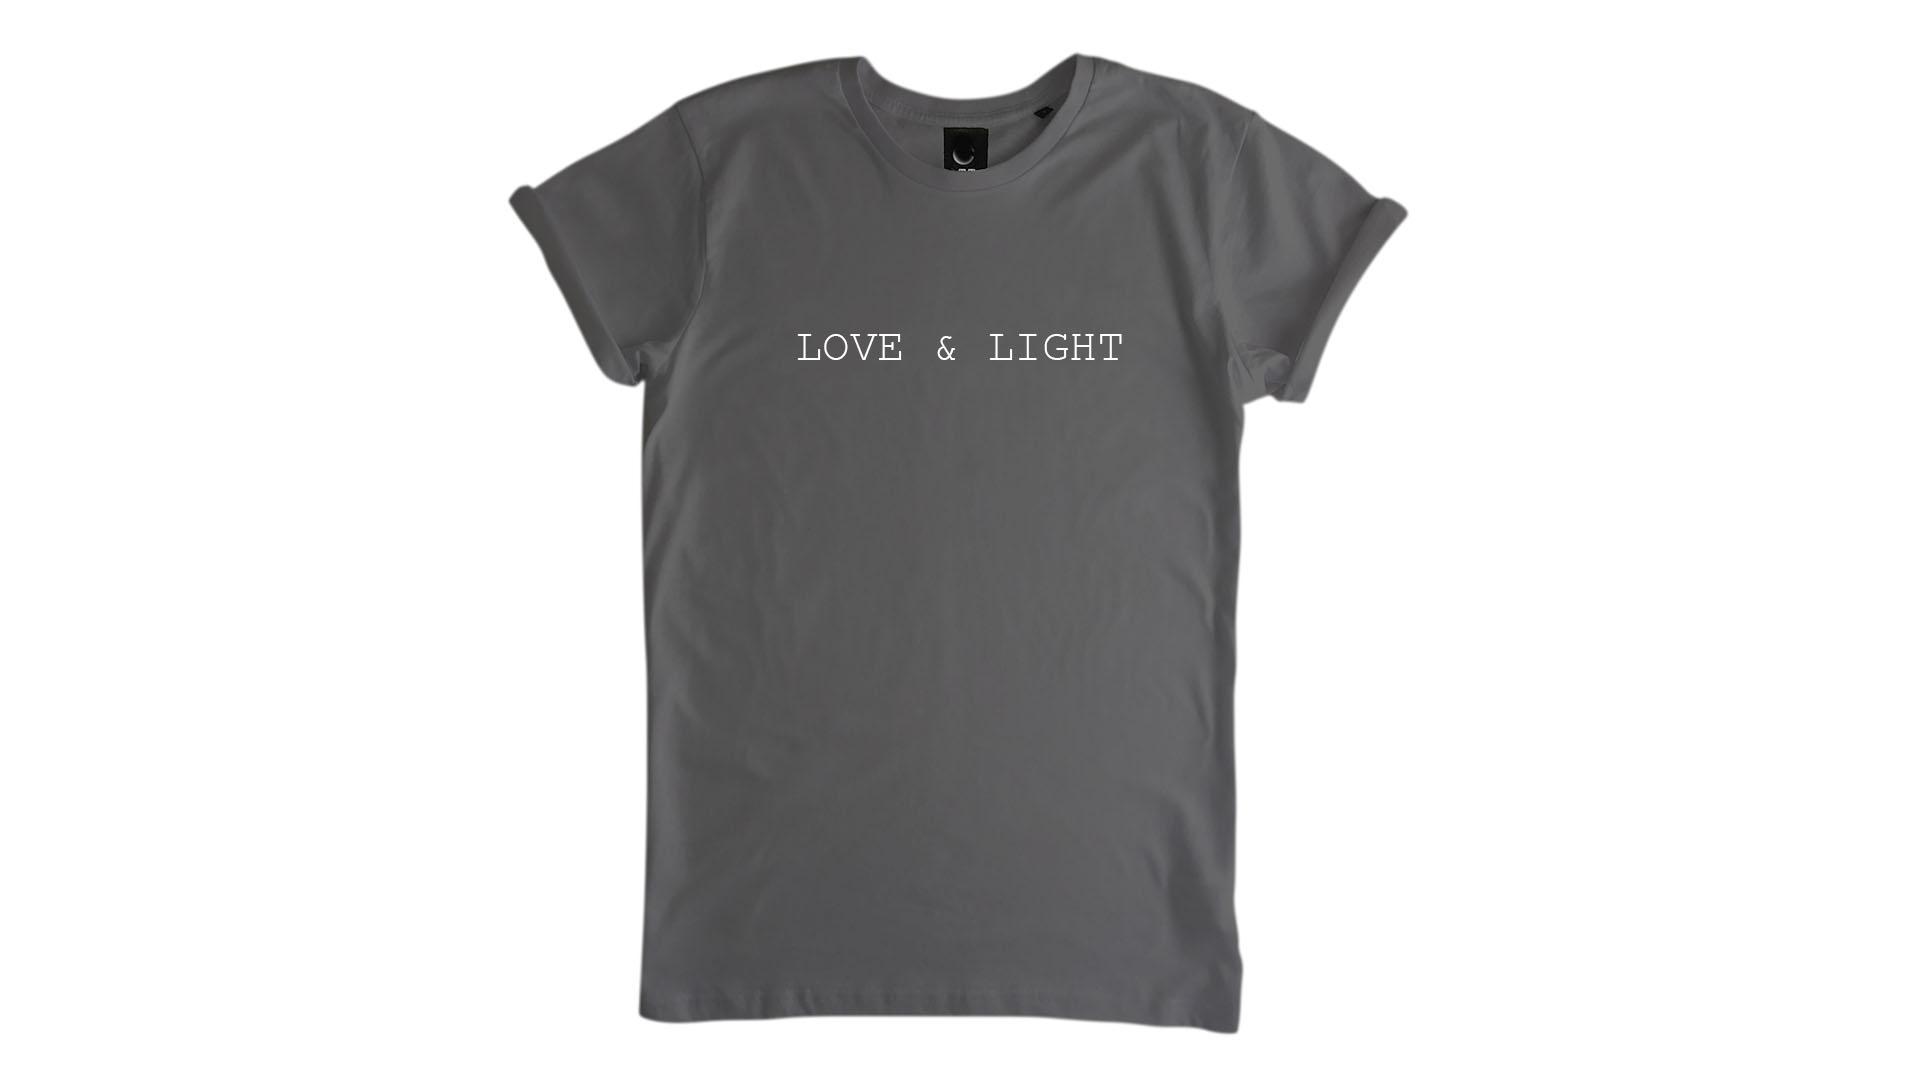 LiveLearn.Yoga Yoga T-Shirt Organic Cotton Love & Light Grey